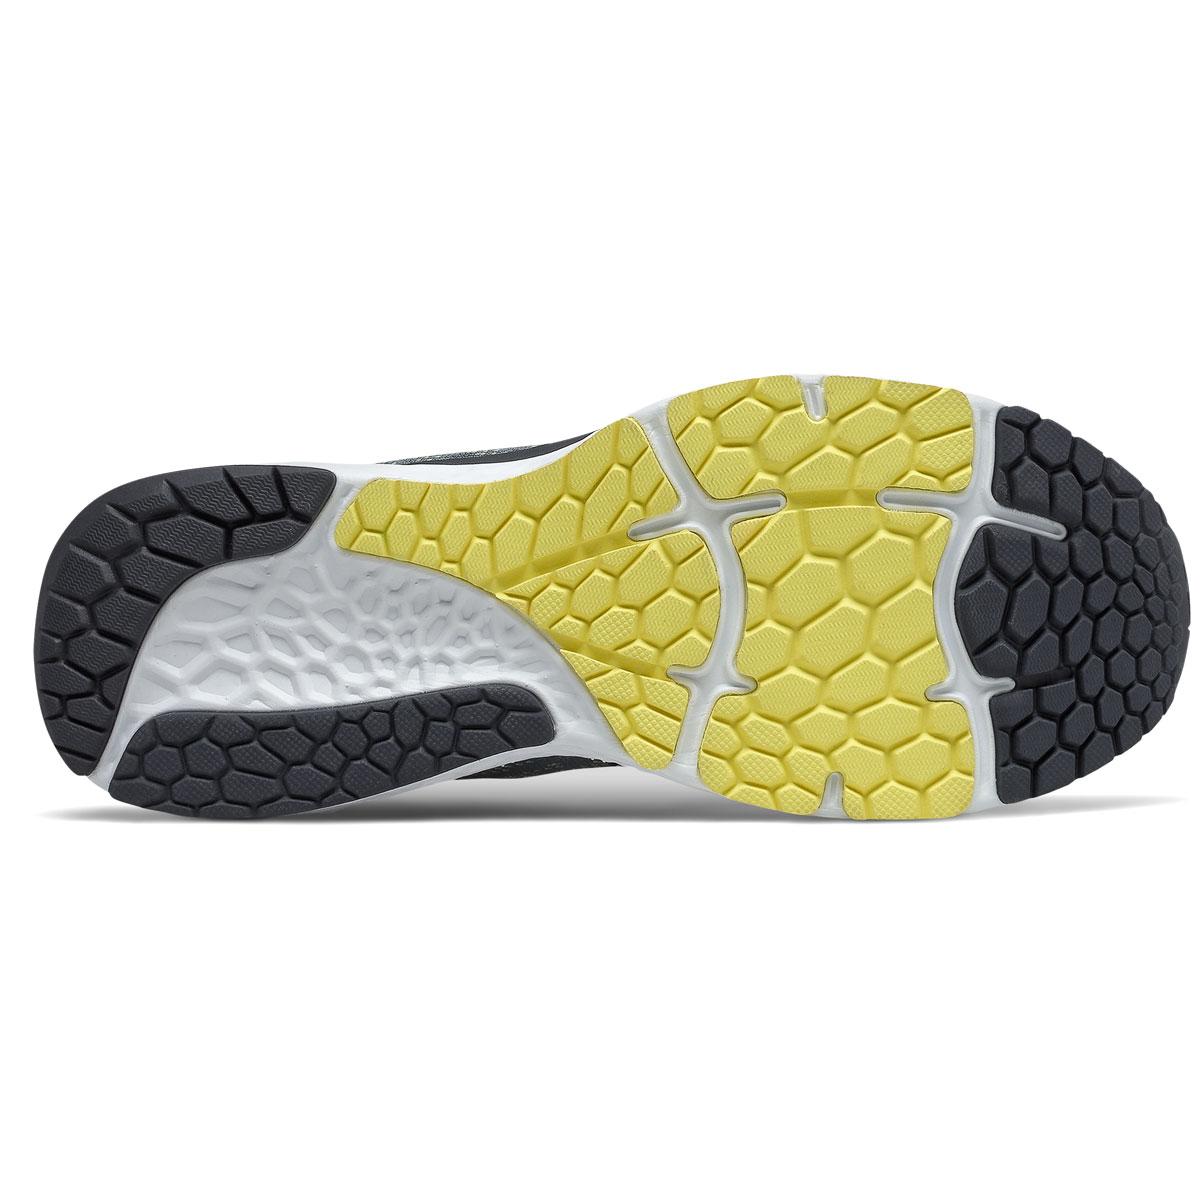 Men's New Balance Fresh Foam 880v11 Running Shoe - Color: Ocean Grey/First Light - Size: 7 - Width: Wide, Ocean Grey/First Light, large, image 4